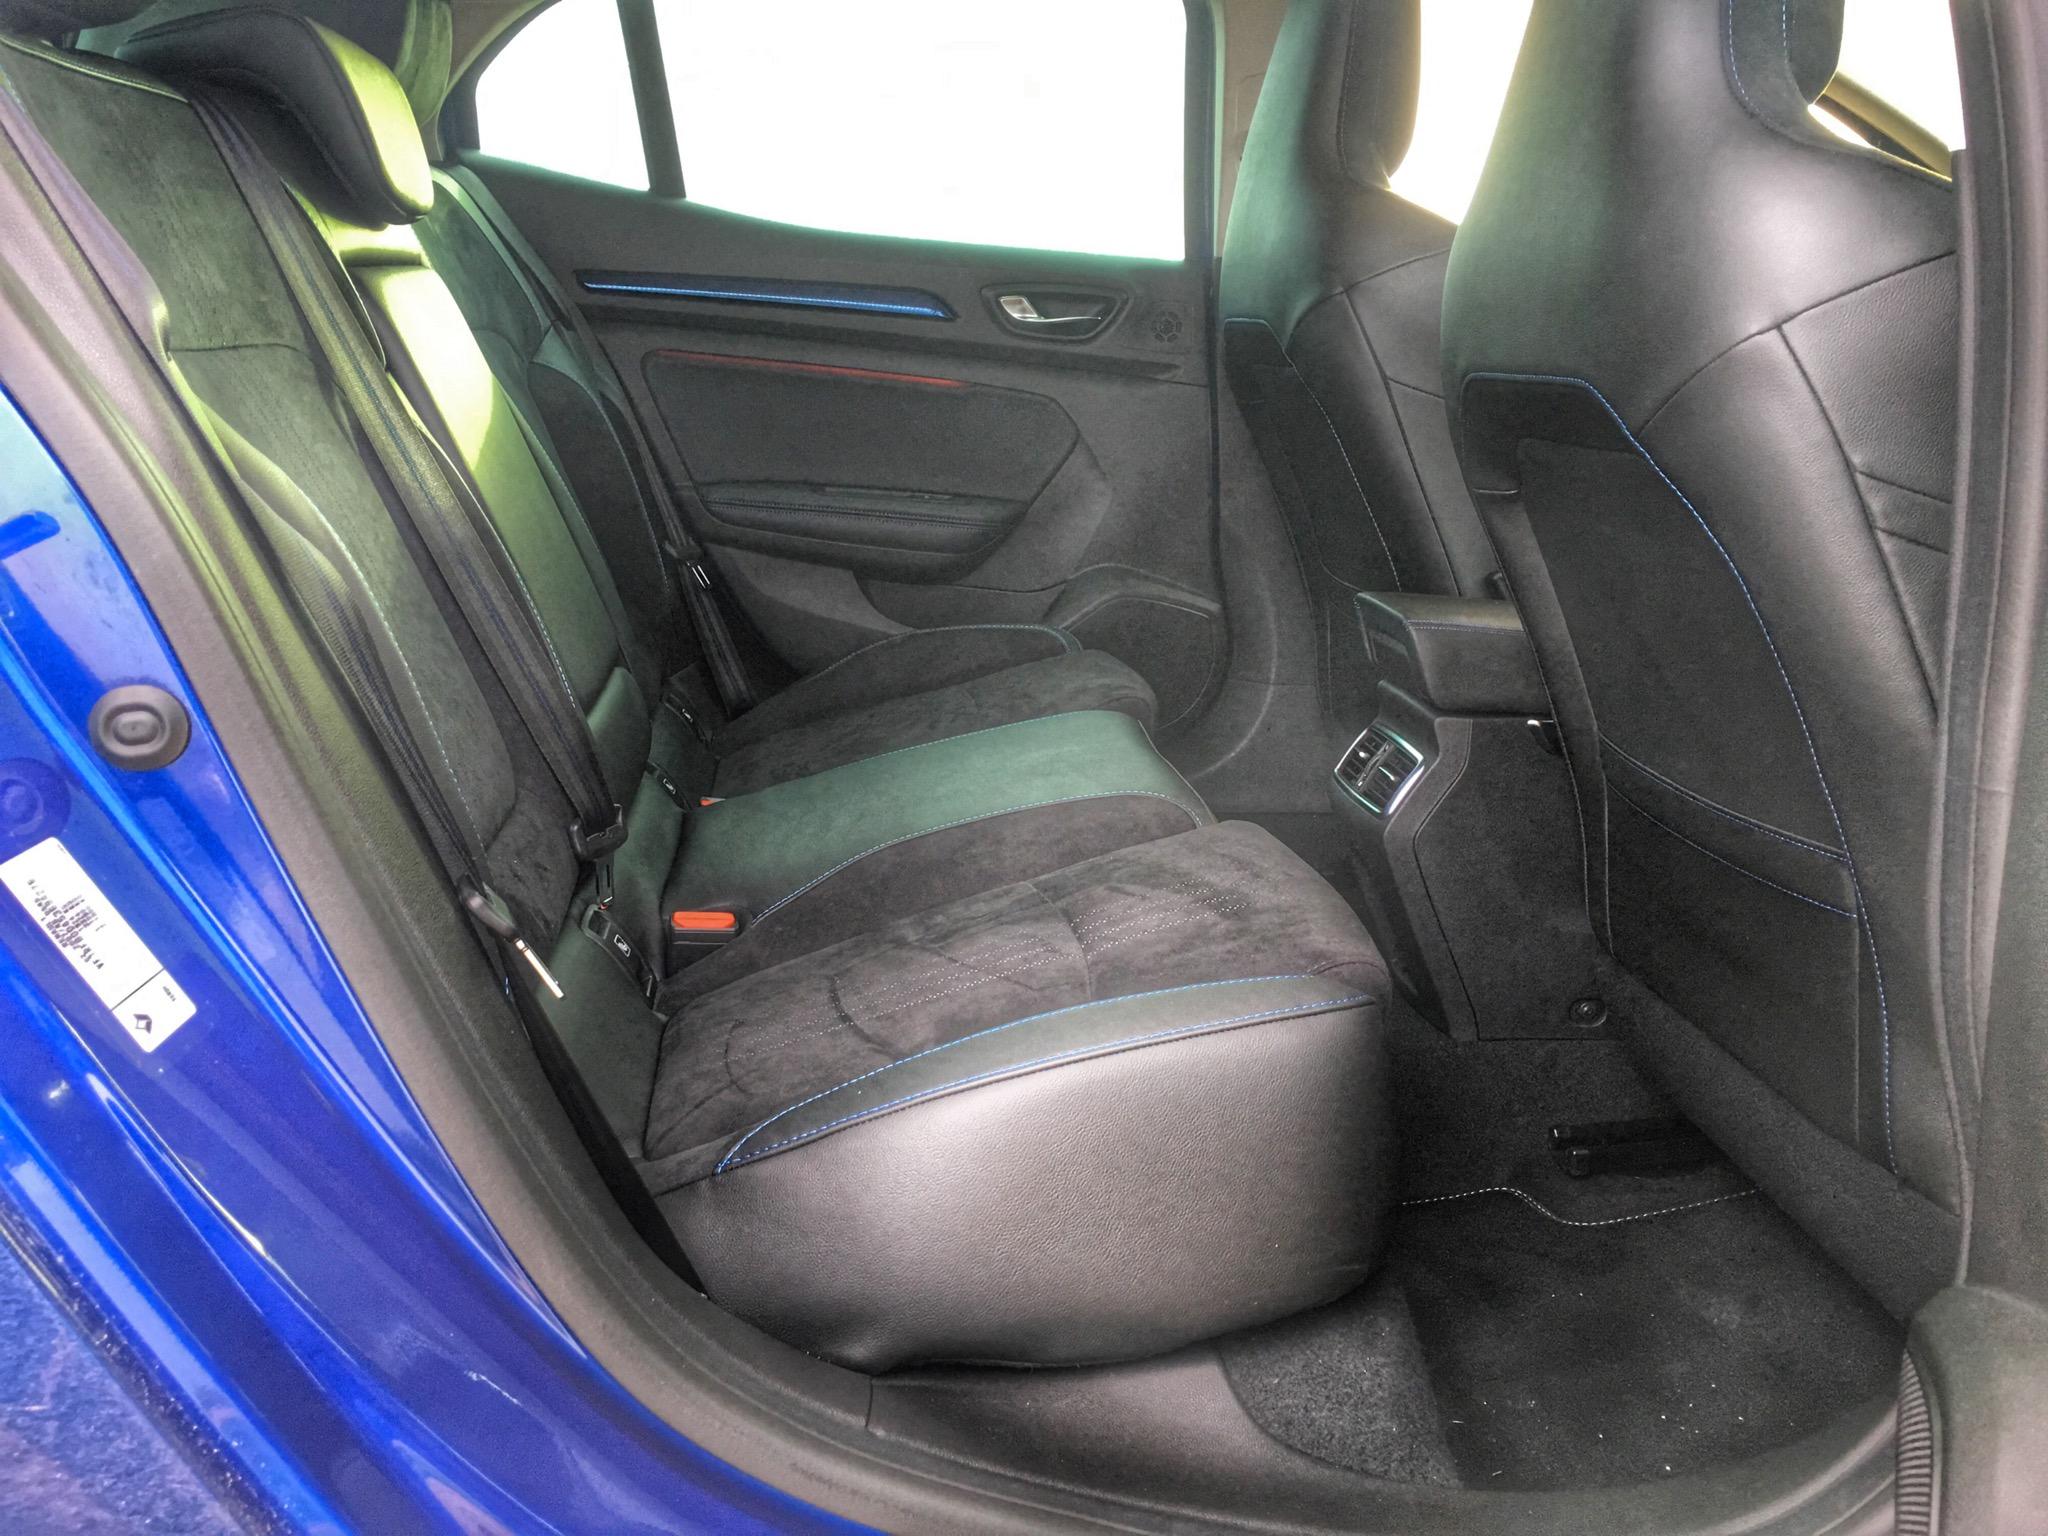 2016 Renault Megane GT Rear Seats Interior